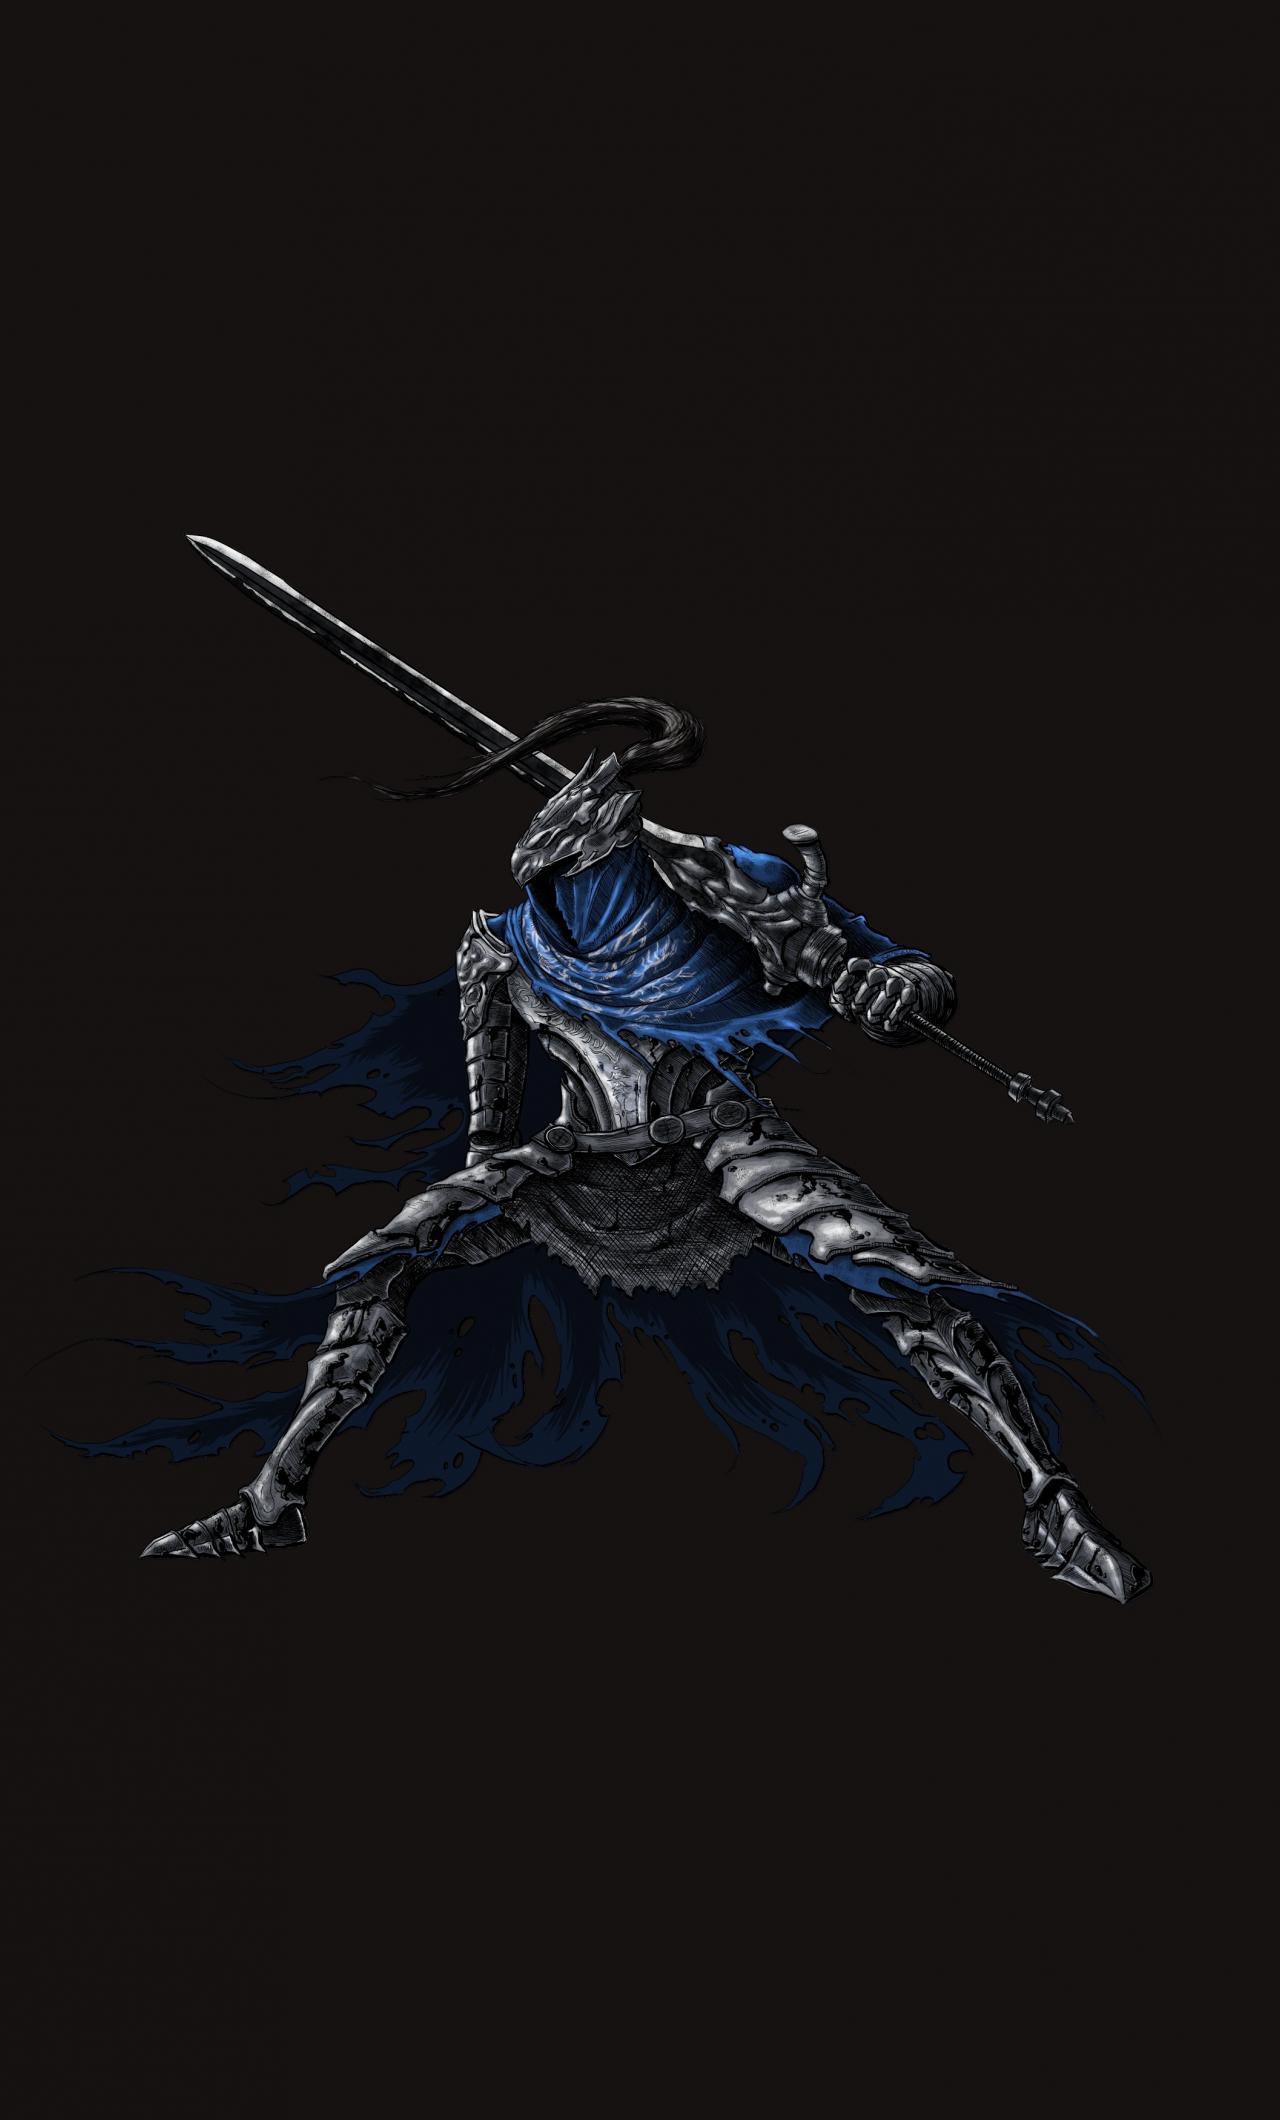 Download 1280x2120 Wallpaper Minimal Warrior Video Game Dark Souls Iphone 6 Plus 1280x2120 Hd Image Background 18027